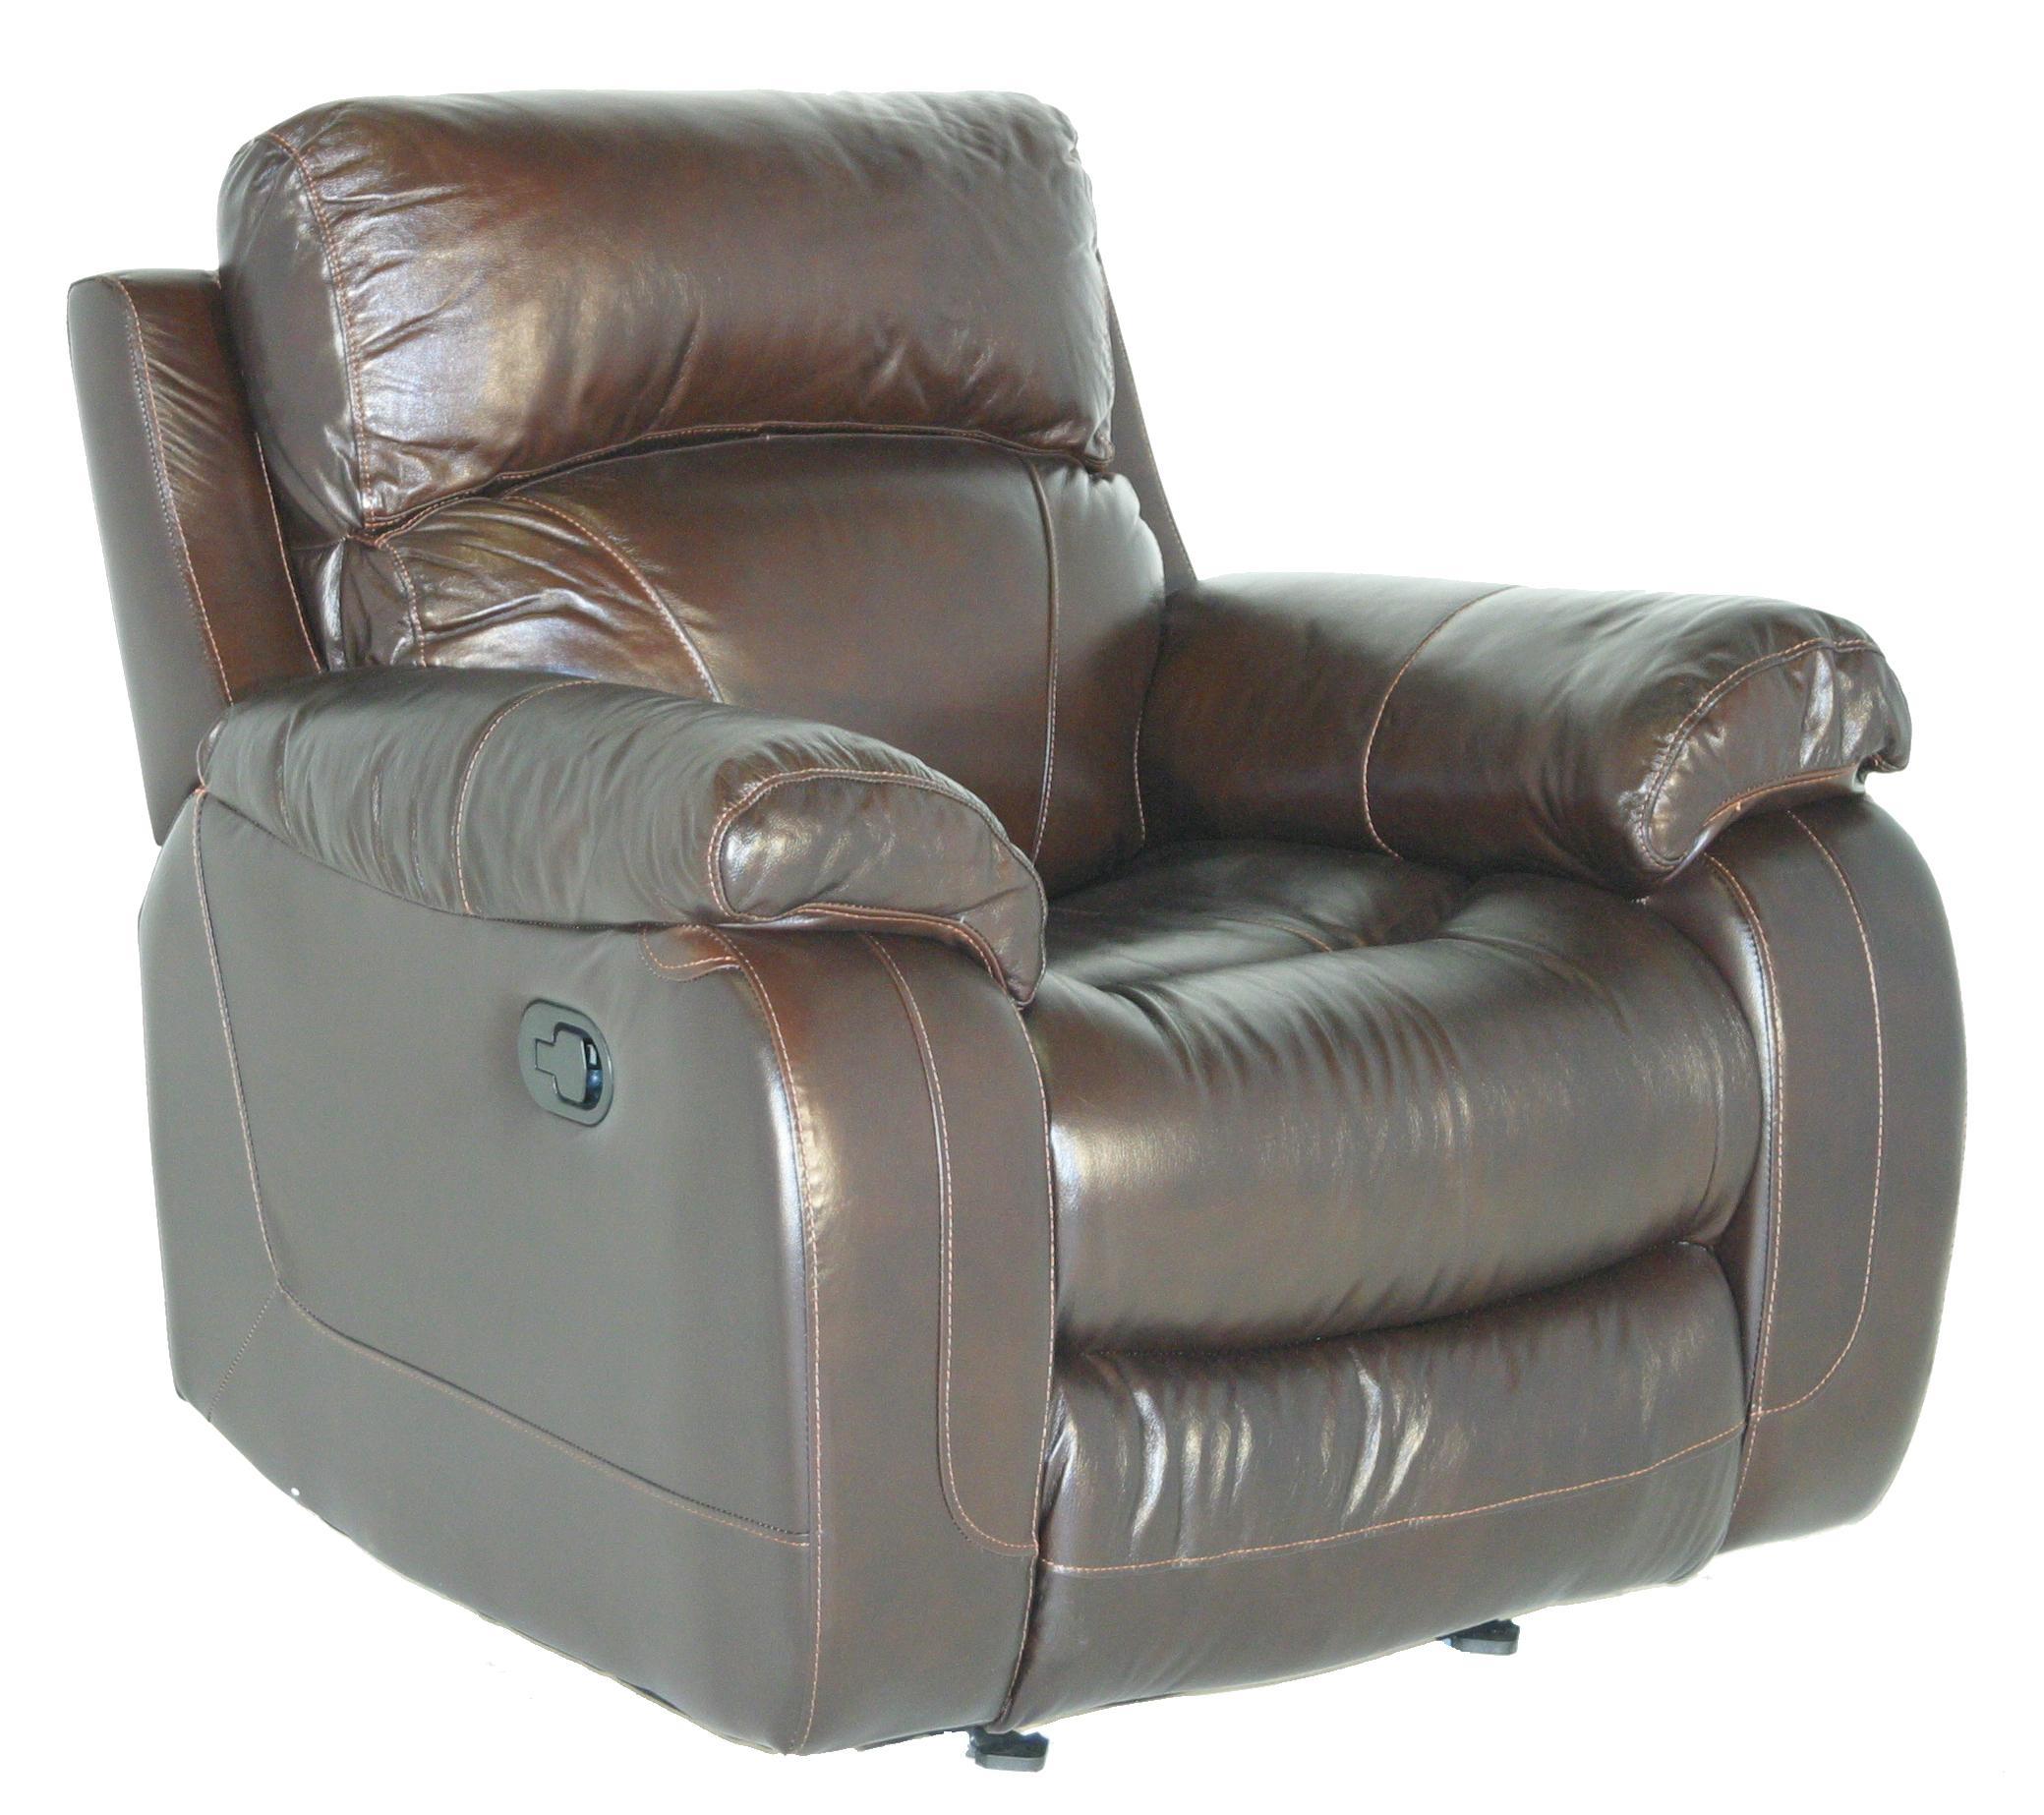 man wah furniture parts